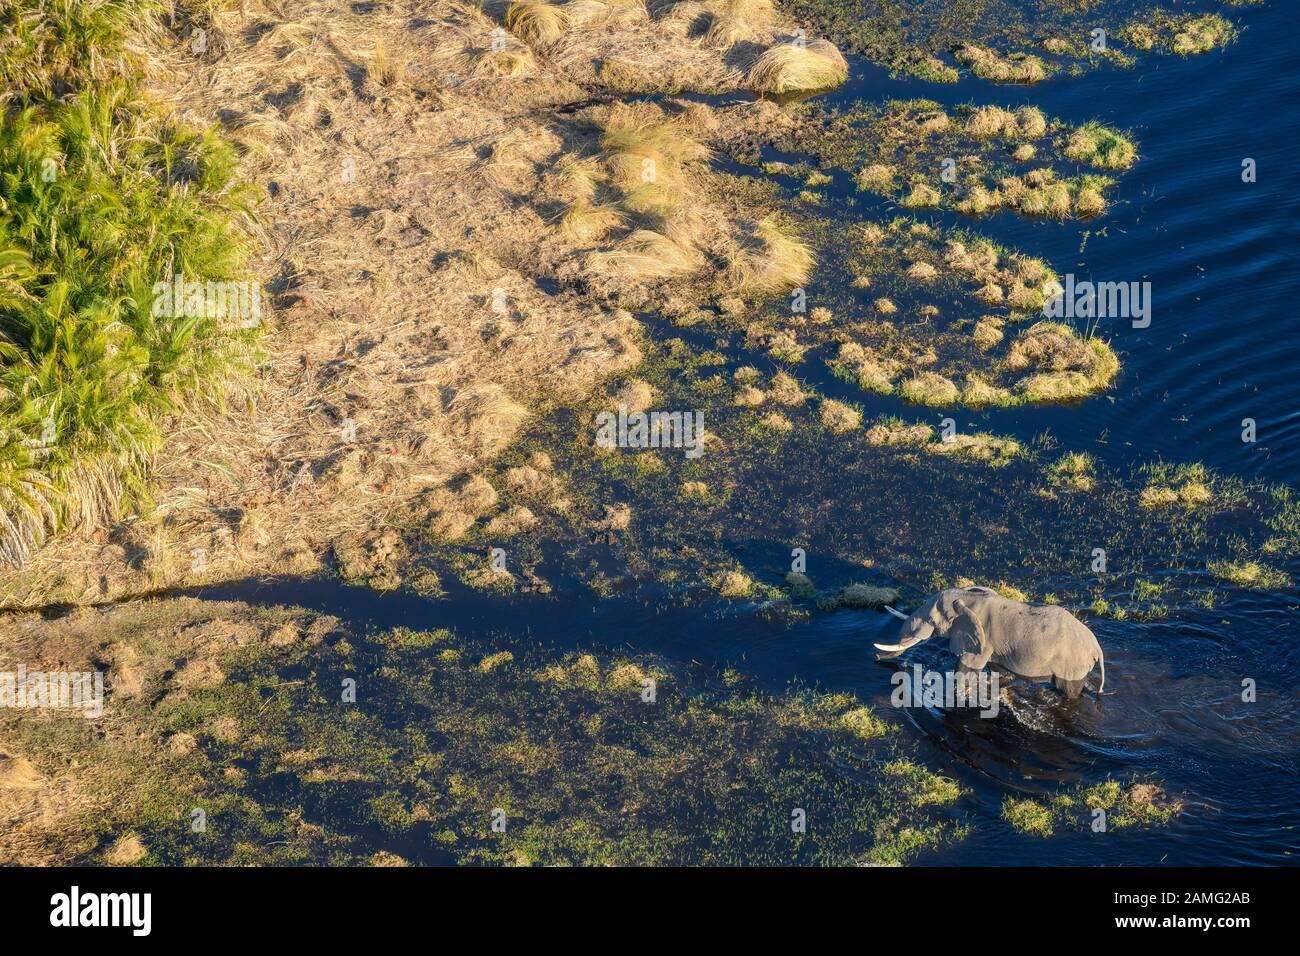 Aerial view of African Elephant, Loxodonta africana, crossing the water, Macatoo, Okavango Delta, Botswana Stock Photo